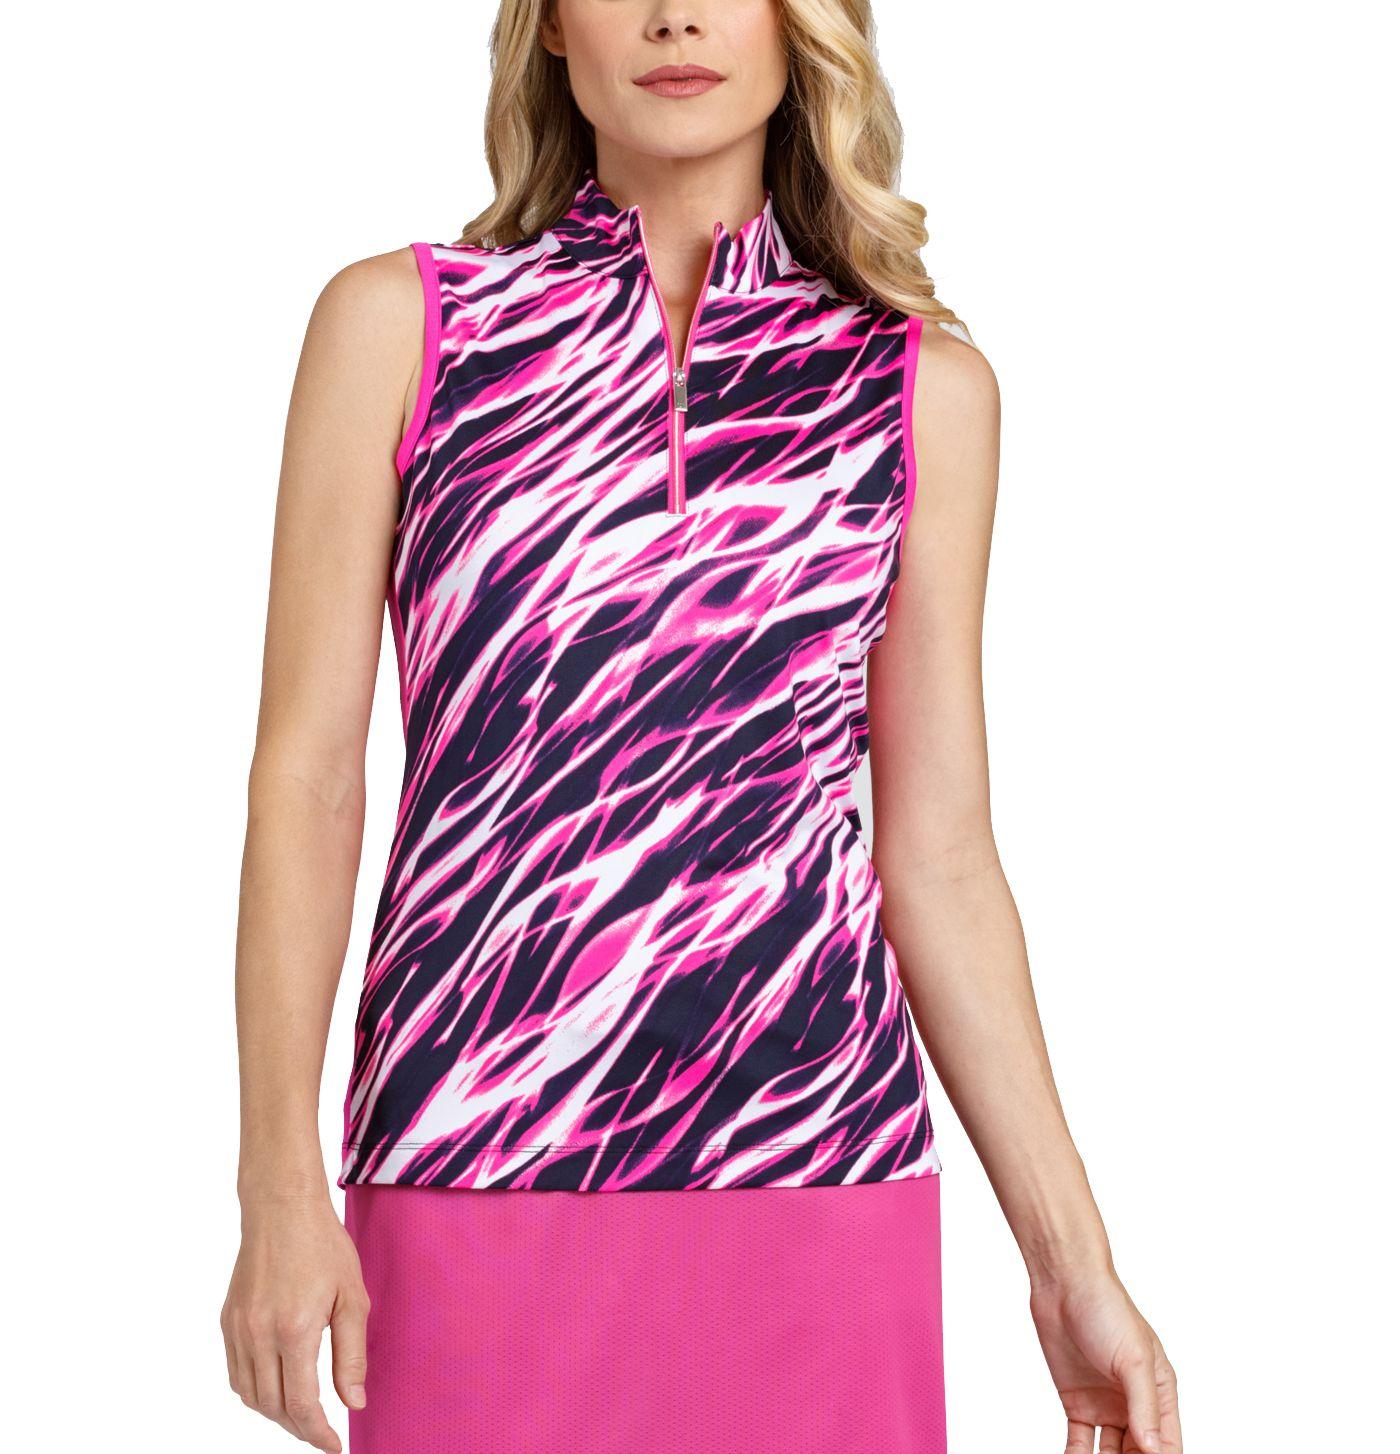 Tail Women's Sleeveless ¼-Zip Mock Neck Golf Top